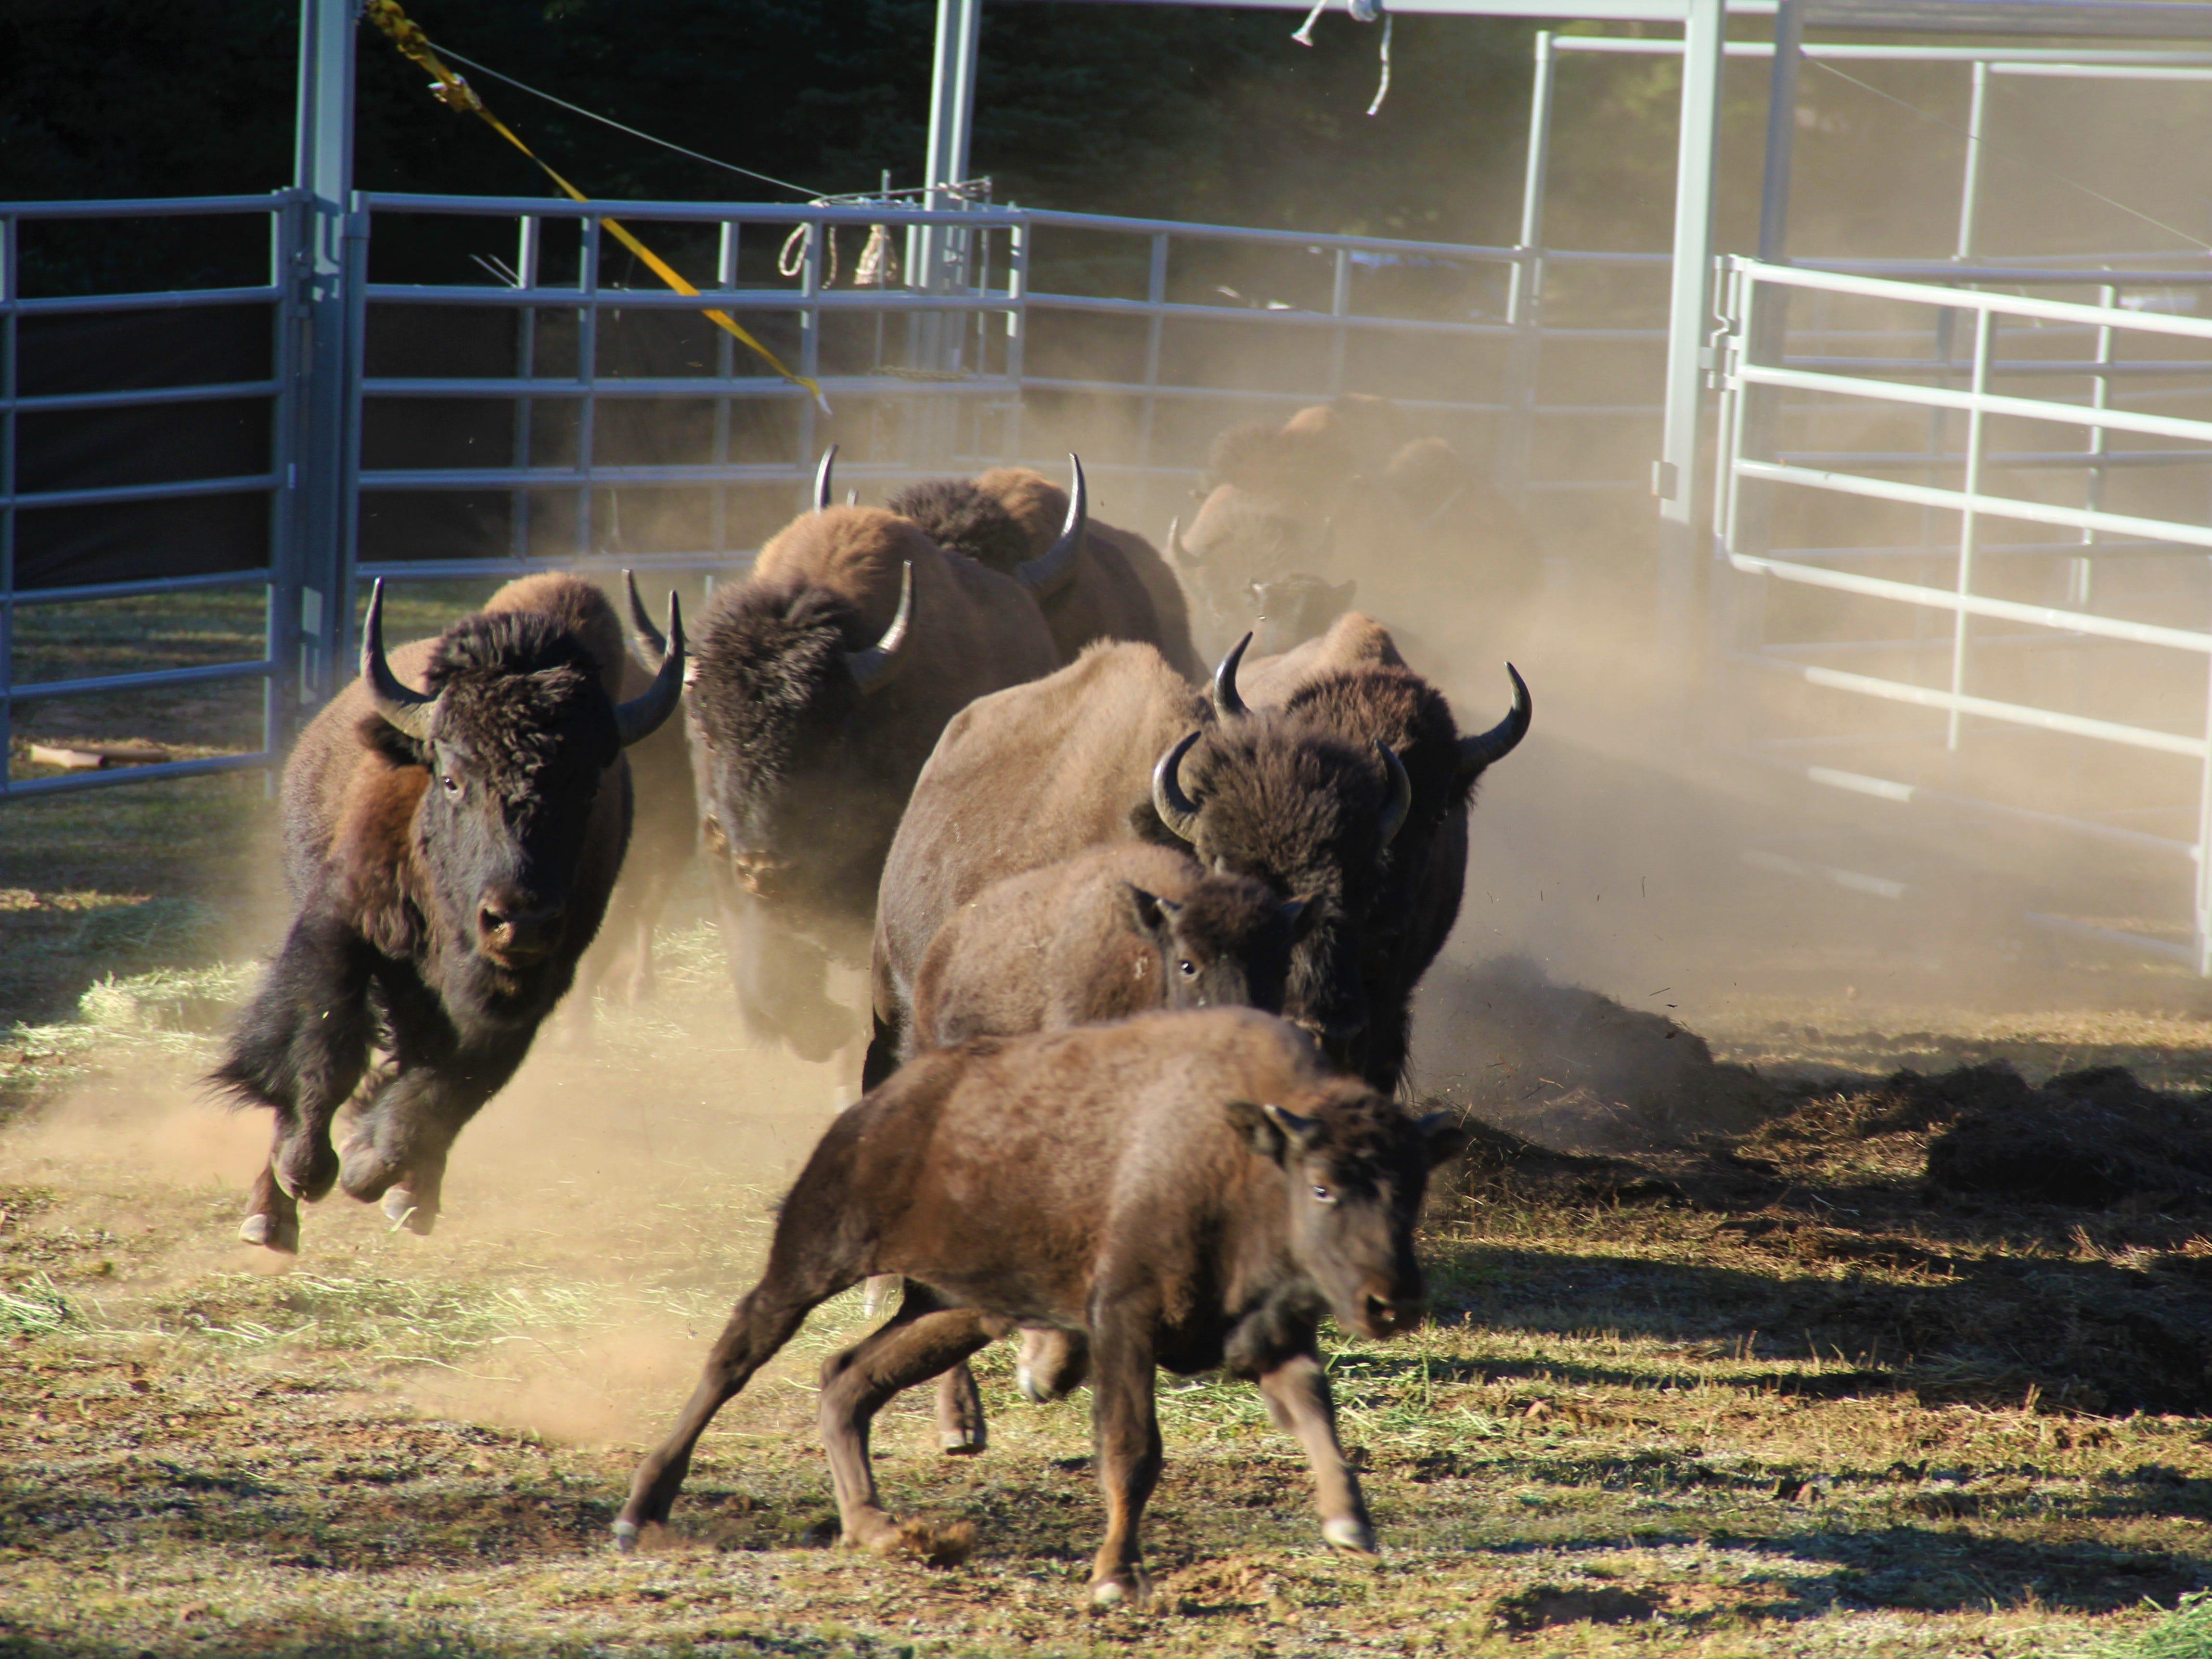 https://eu.azcentral.com/story/travel/arizona/grand-canyon/2021/04/28/grand-canyon-bison-hunt-signup-2021/4861633001/